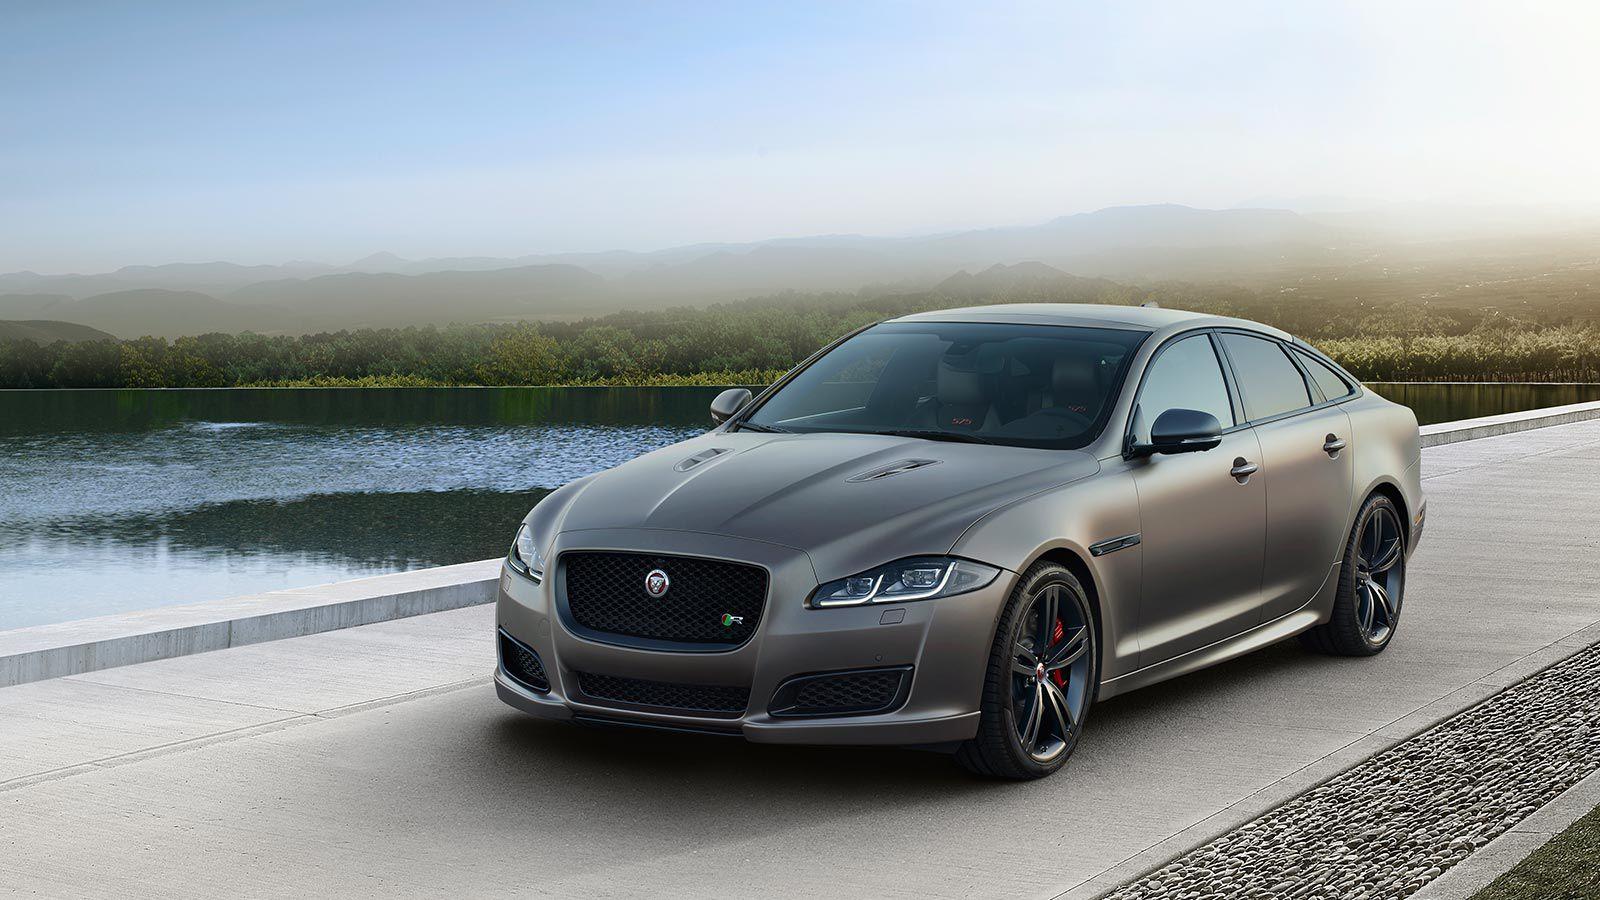 Jaguar XJ Gallery | Jaguar XJ Saloon Car | Jaguar New Zealand